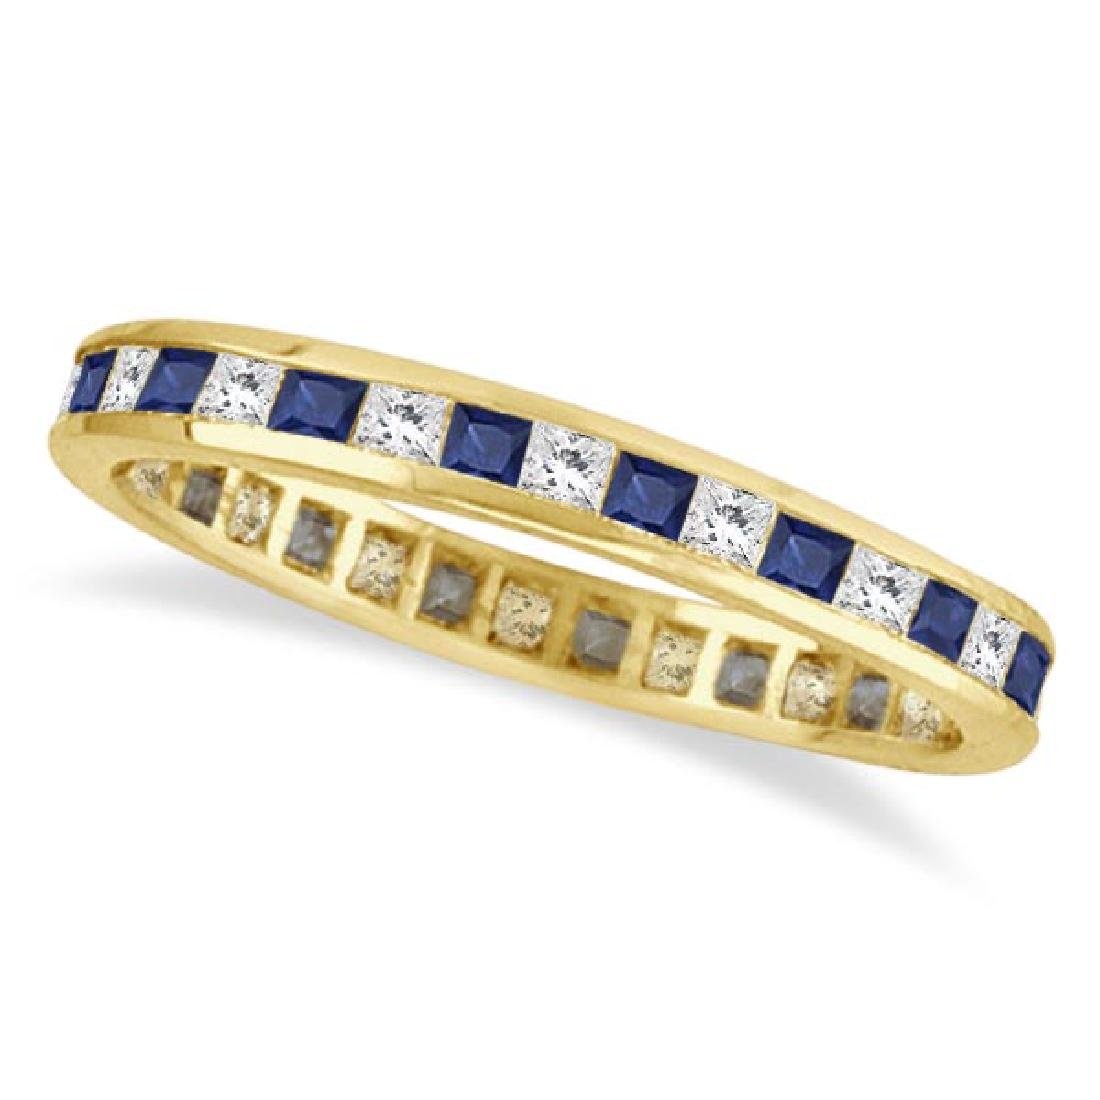 Princess-Cut Sapphire and Diamond Eternity Ring 14k Yel